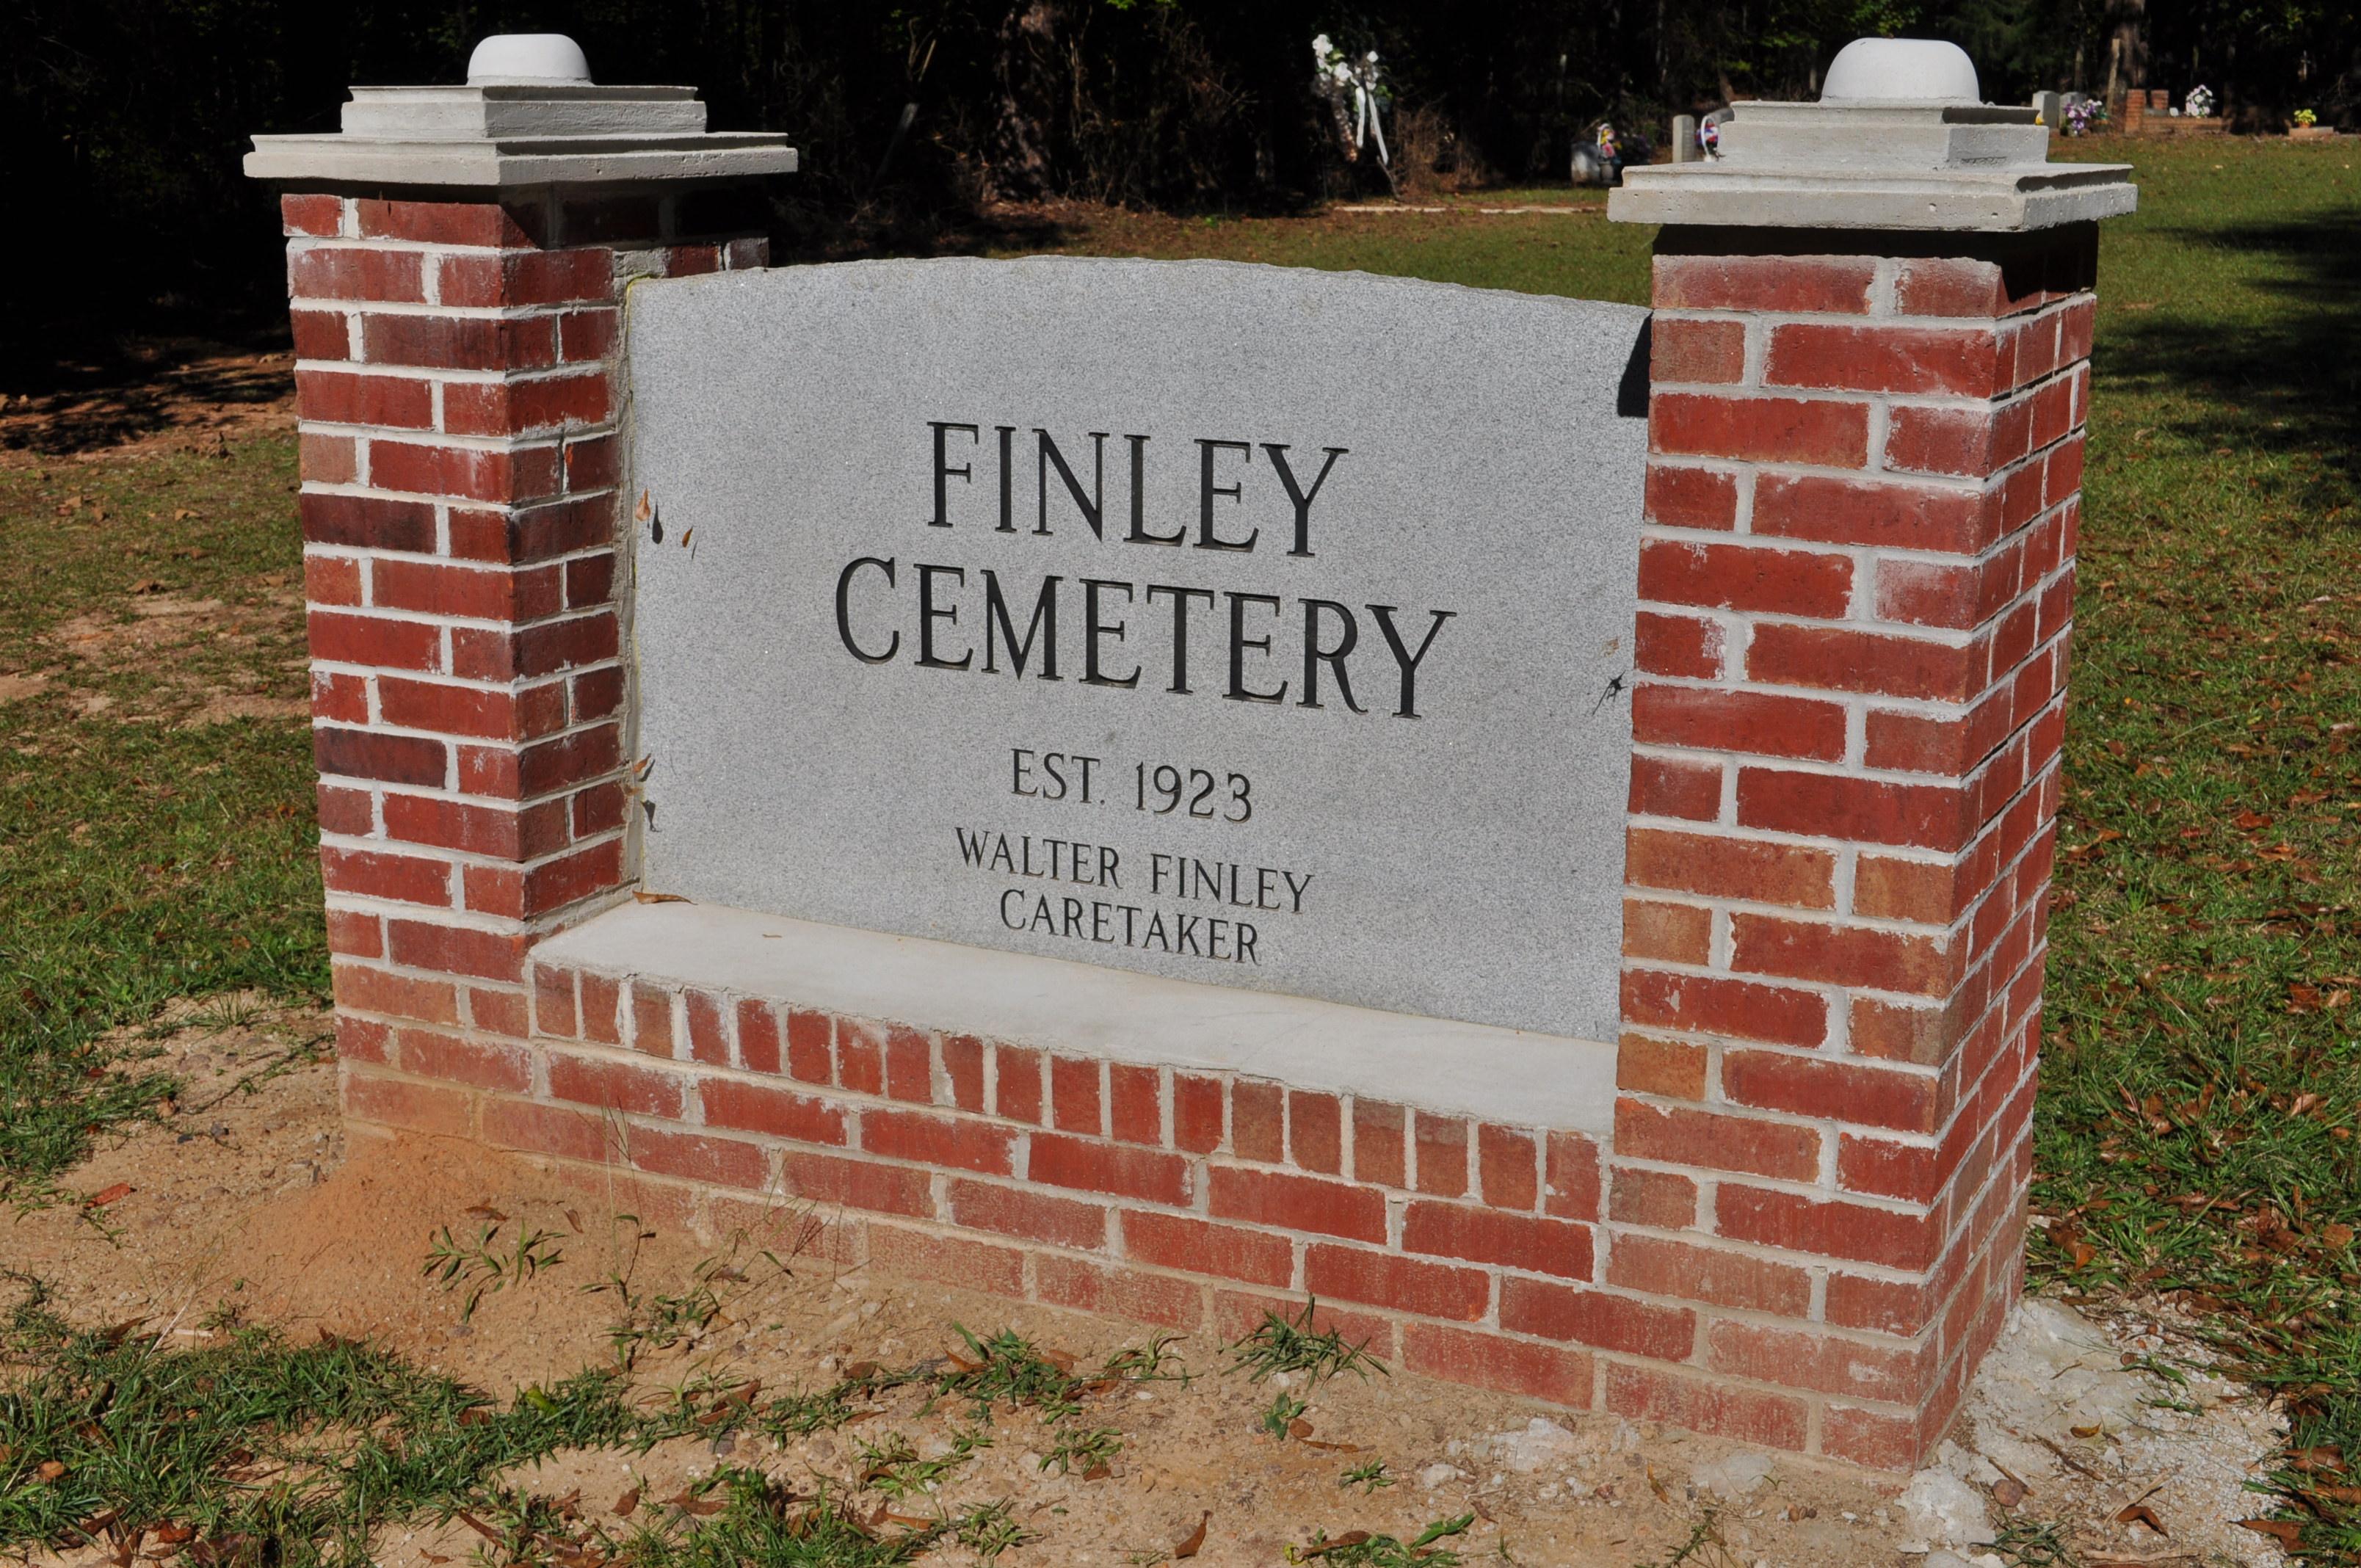 Finley Cemetery